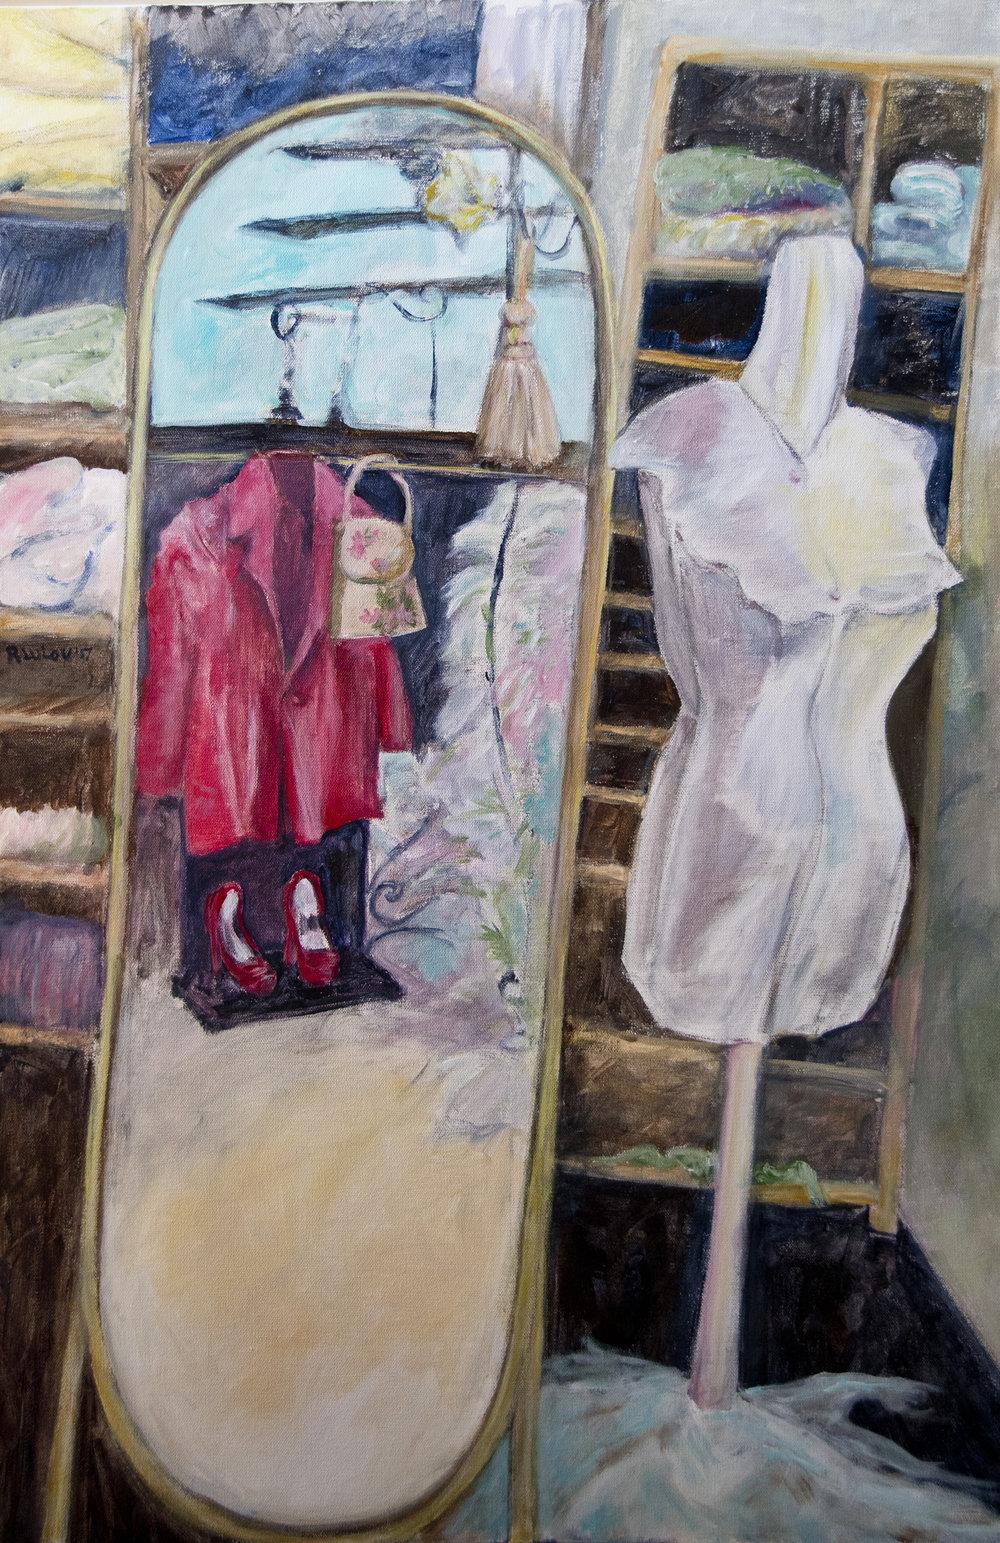 The Dressmakers Shop acrylic on canvas 24 x 36 Rachel Lulov Segall